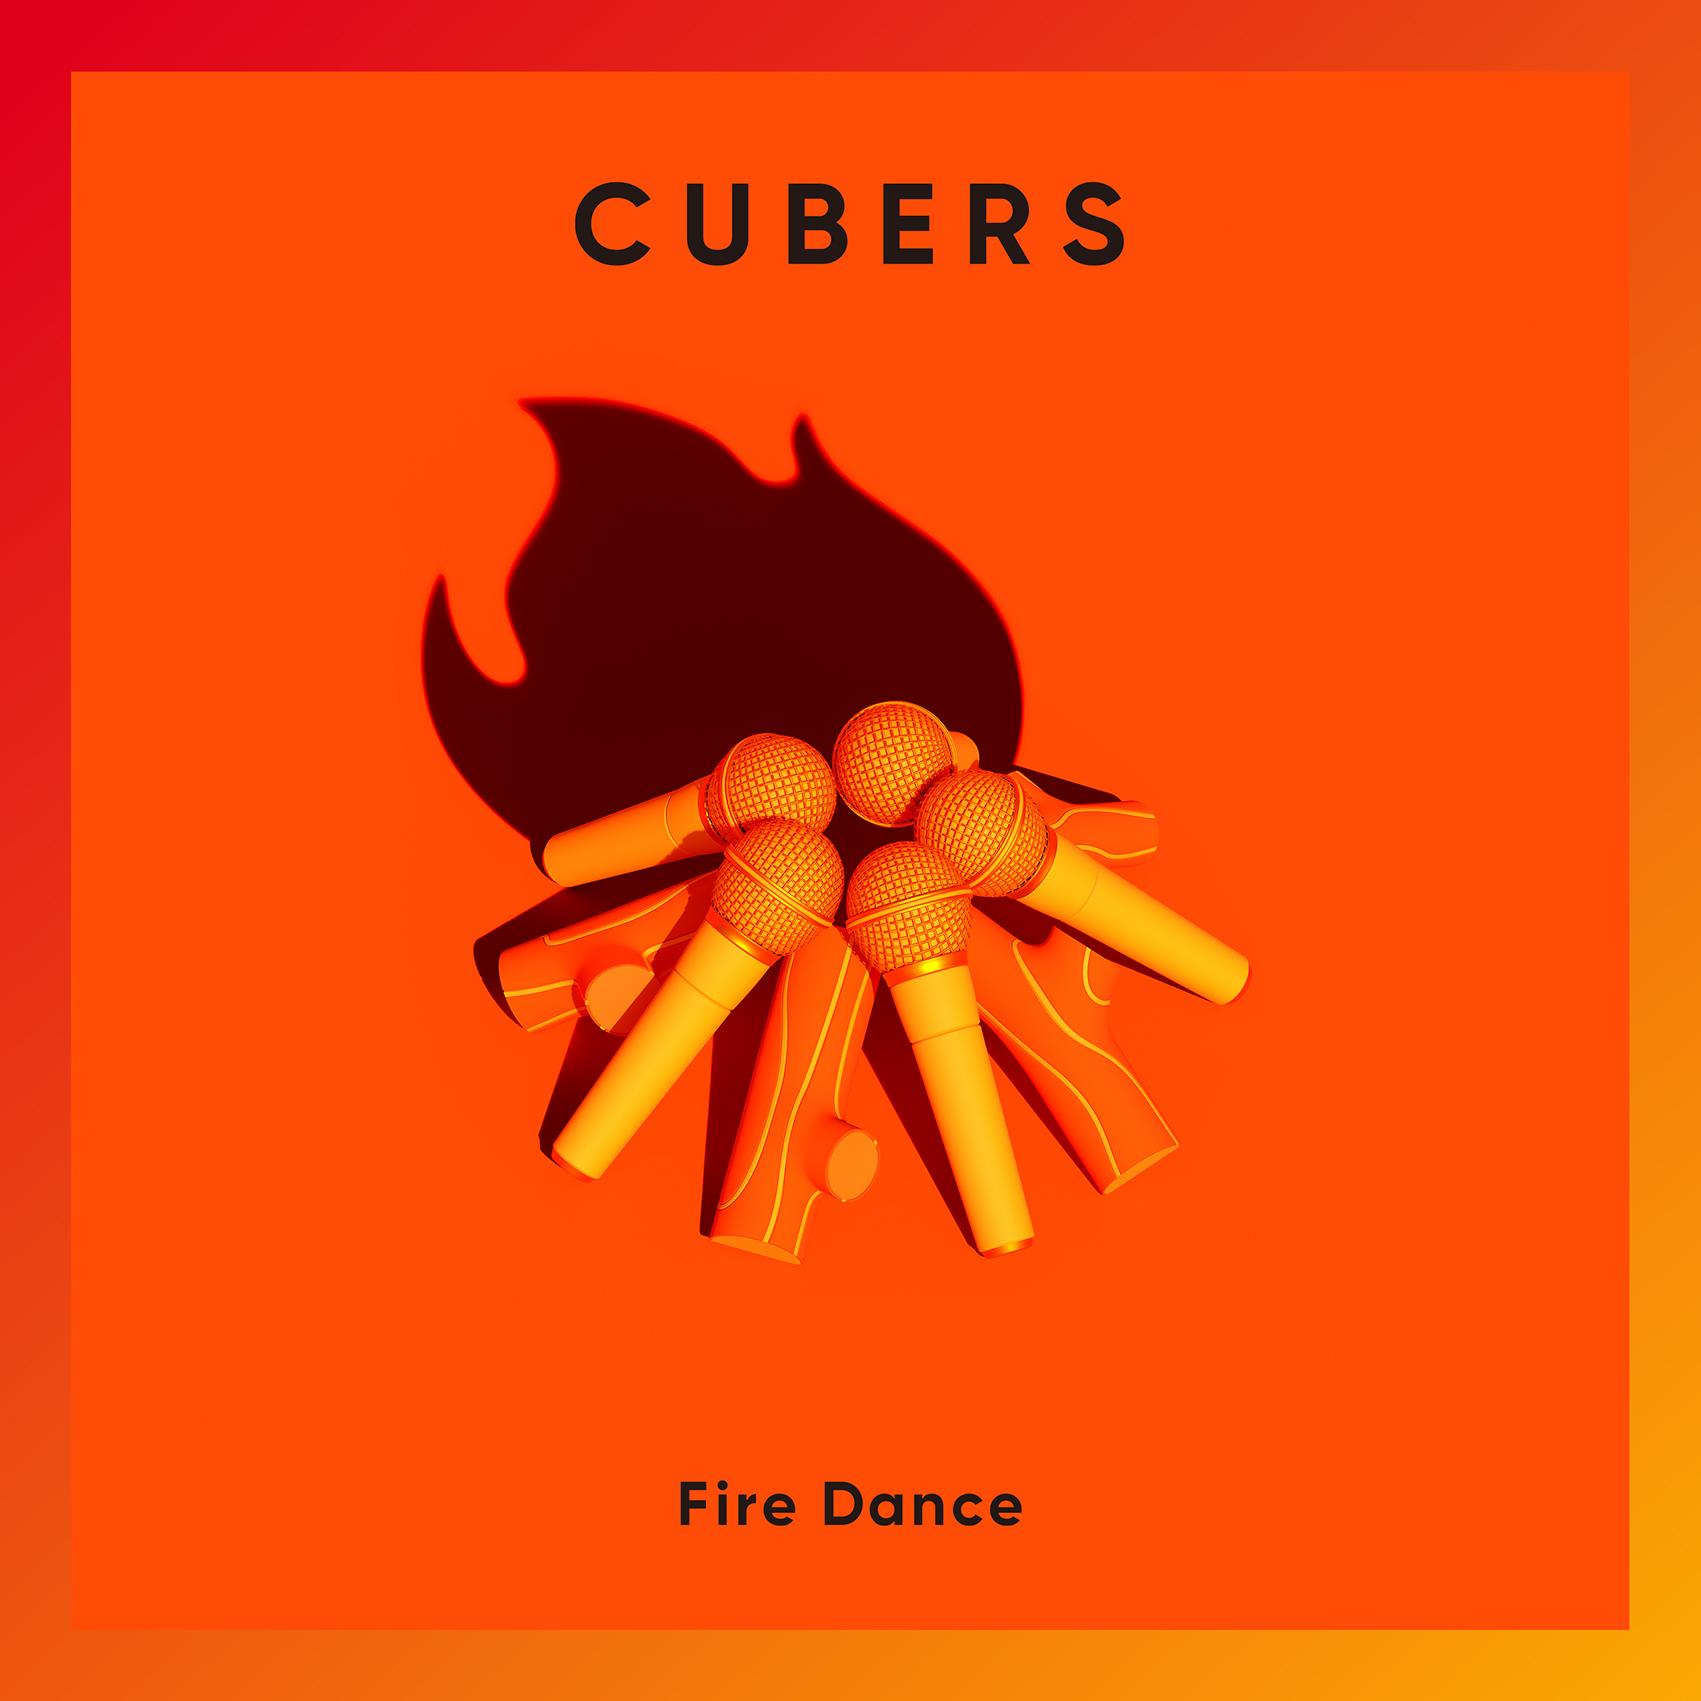 CUBERS_FireDance_H1_RGB